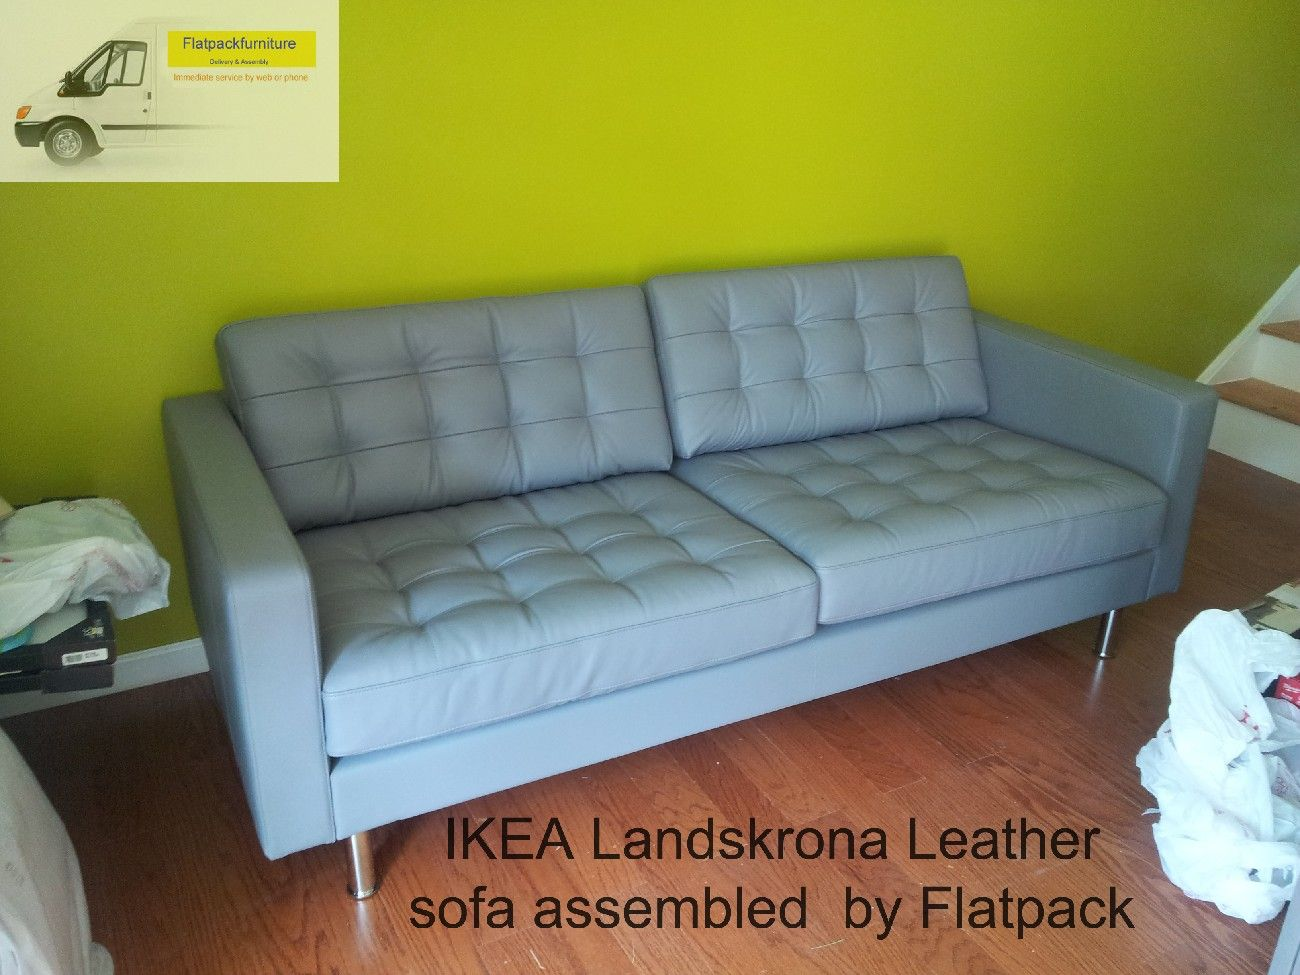 Groovy Top 10 Best Ikea Installers In Fairfax Va Furniture Machost Co Dining Chair Design Ideas Machostcouk